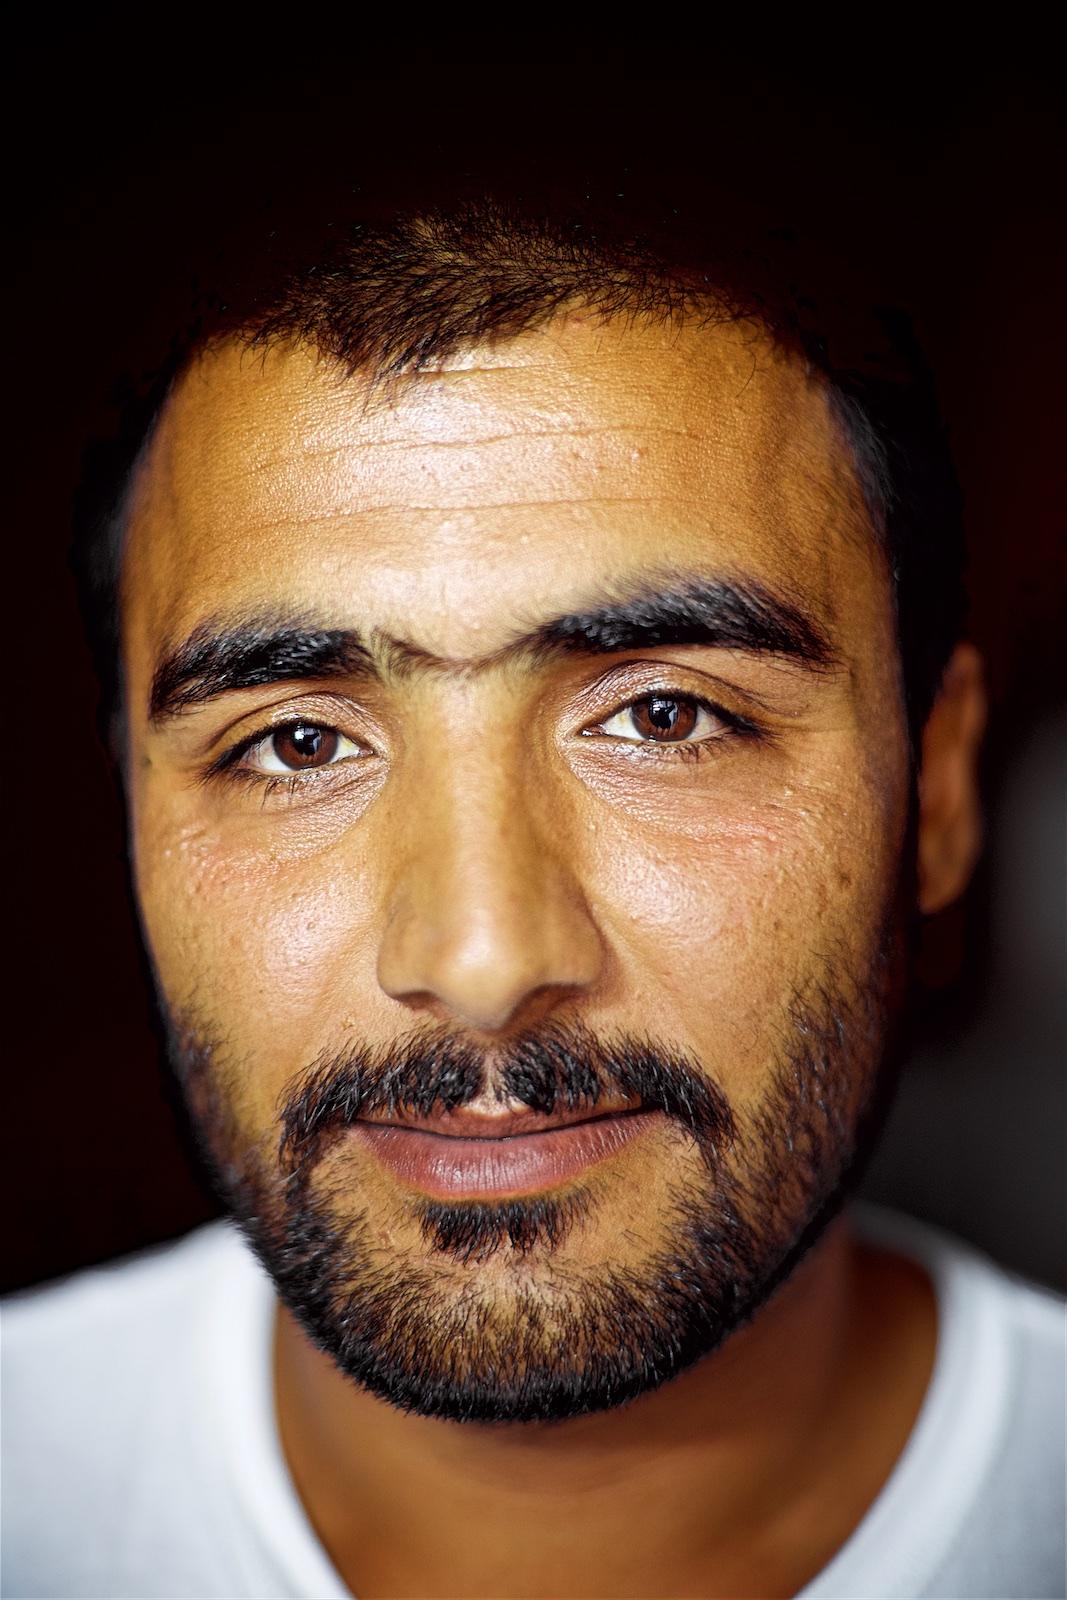 permanently-temporary-refugees-italy-rifugiati-italia-denis-bosnic-photography-portraits-1.jpg